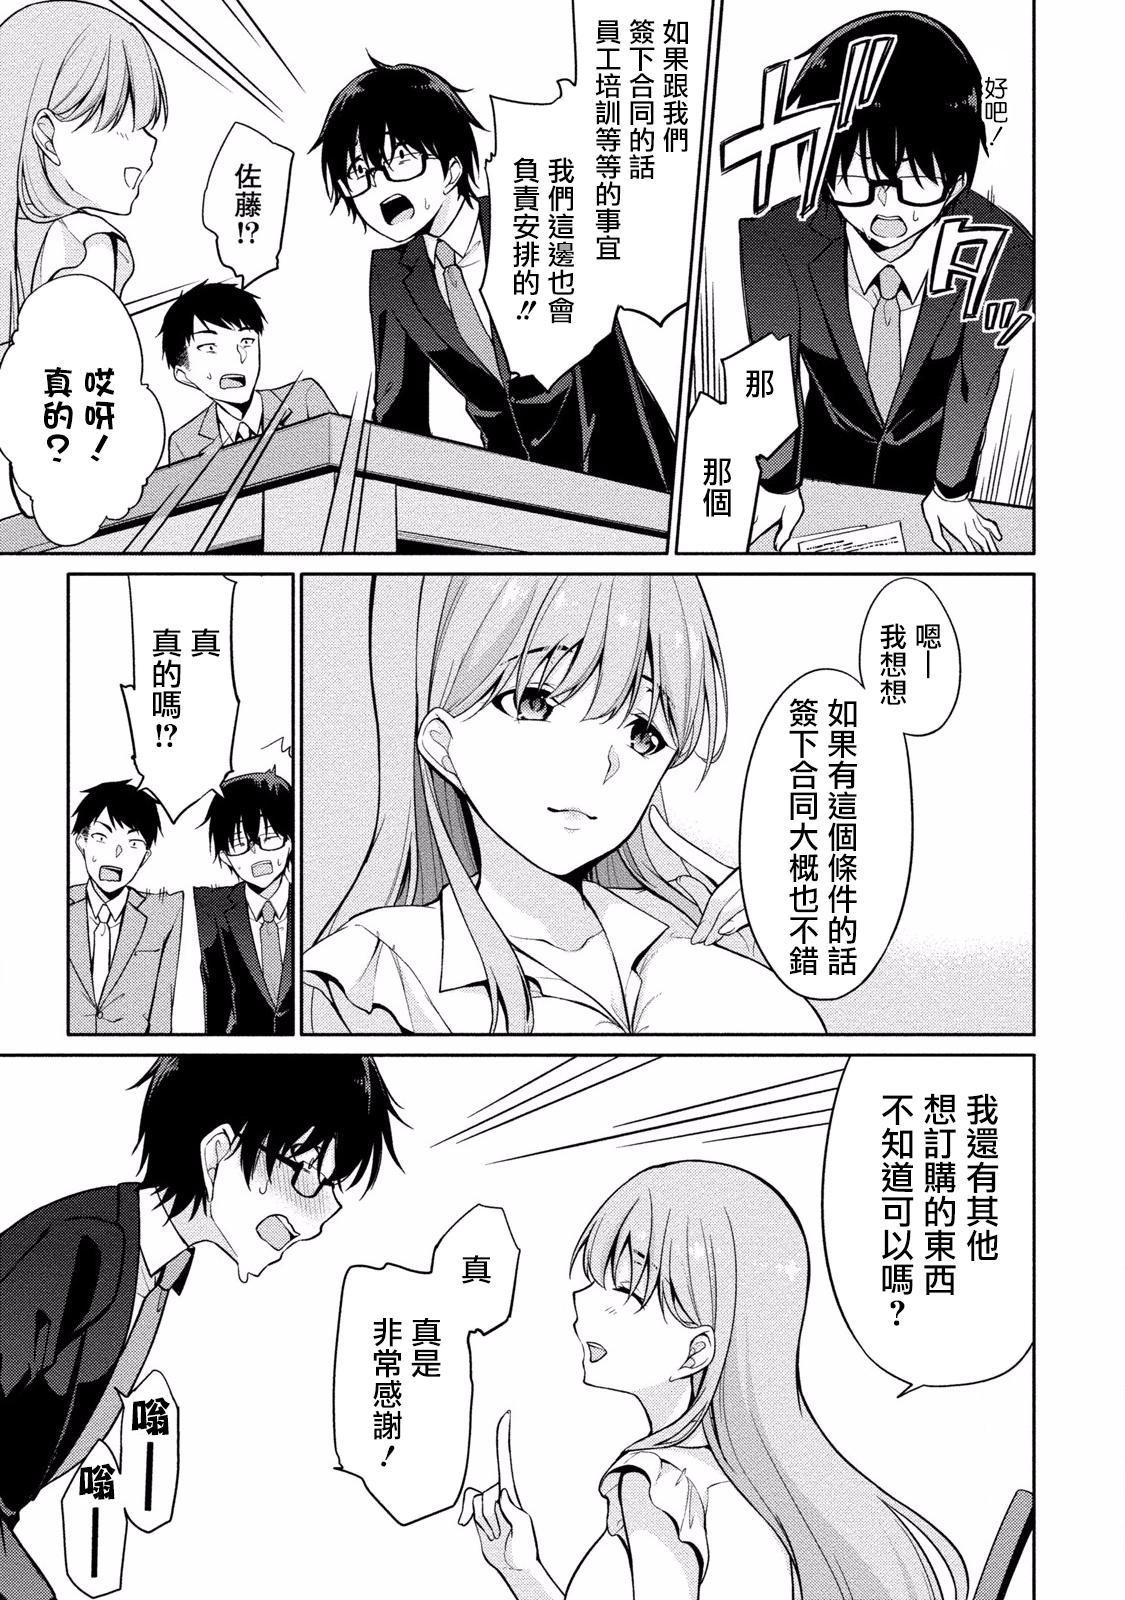 [Yukino] Satou-kun wa Miteiru. ~Kami-sama Appli de Onnanoko no Kokoro o Nozoitara Do XX datta~ Ch. 2 | 佐藤君正在偷窥。~用神大人的APP偷窥女孩子的内心却发现原来是抖XX~02话 [Chinese] [前线作♂战♀基地] 8